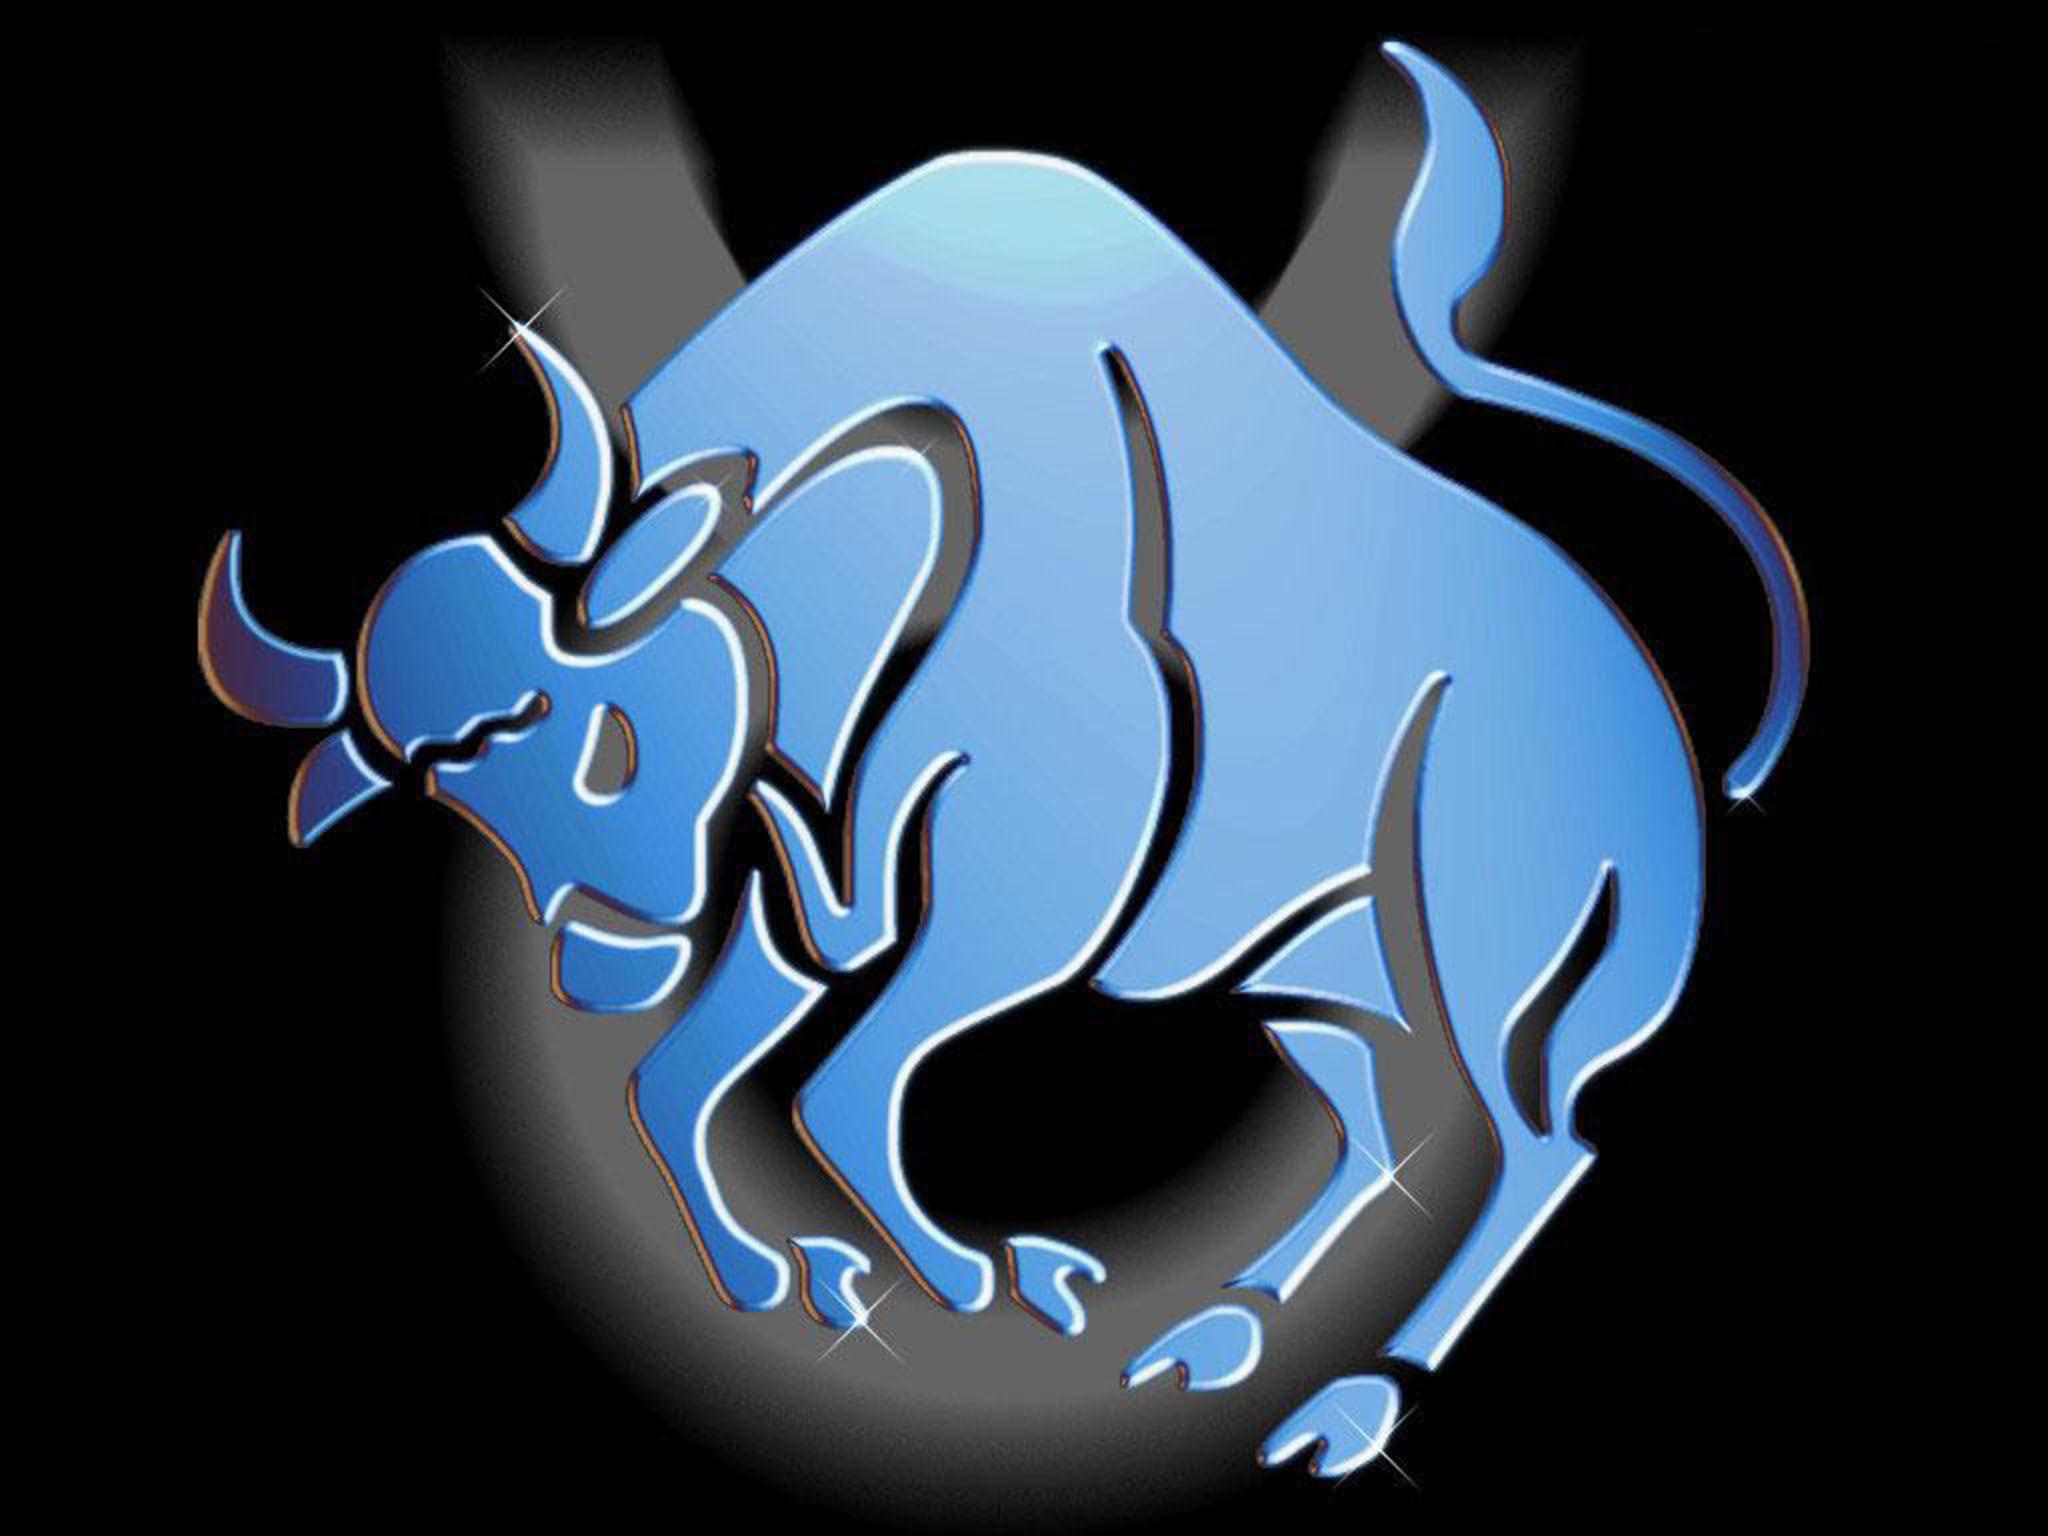 Taurus Zodiac Sign Wallpaper 52 Images